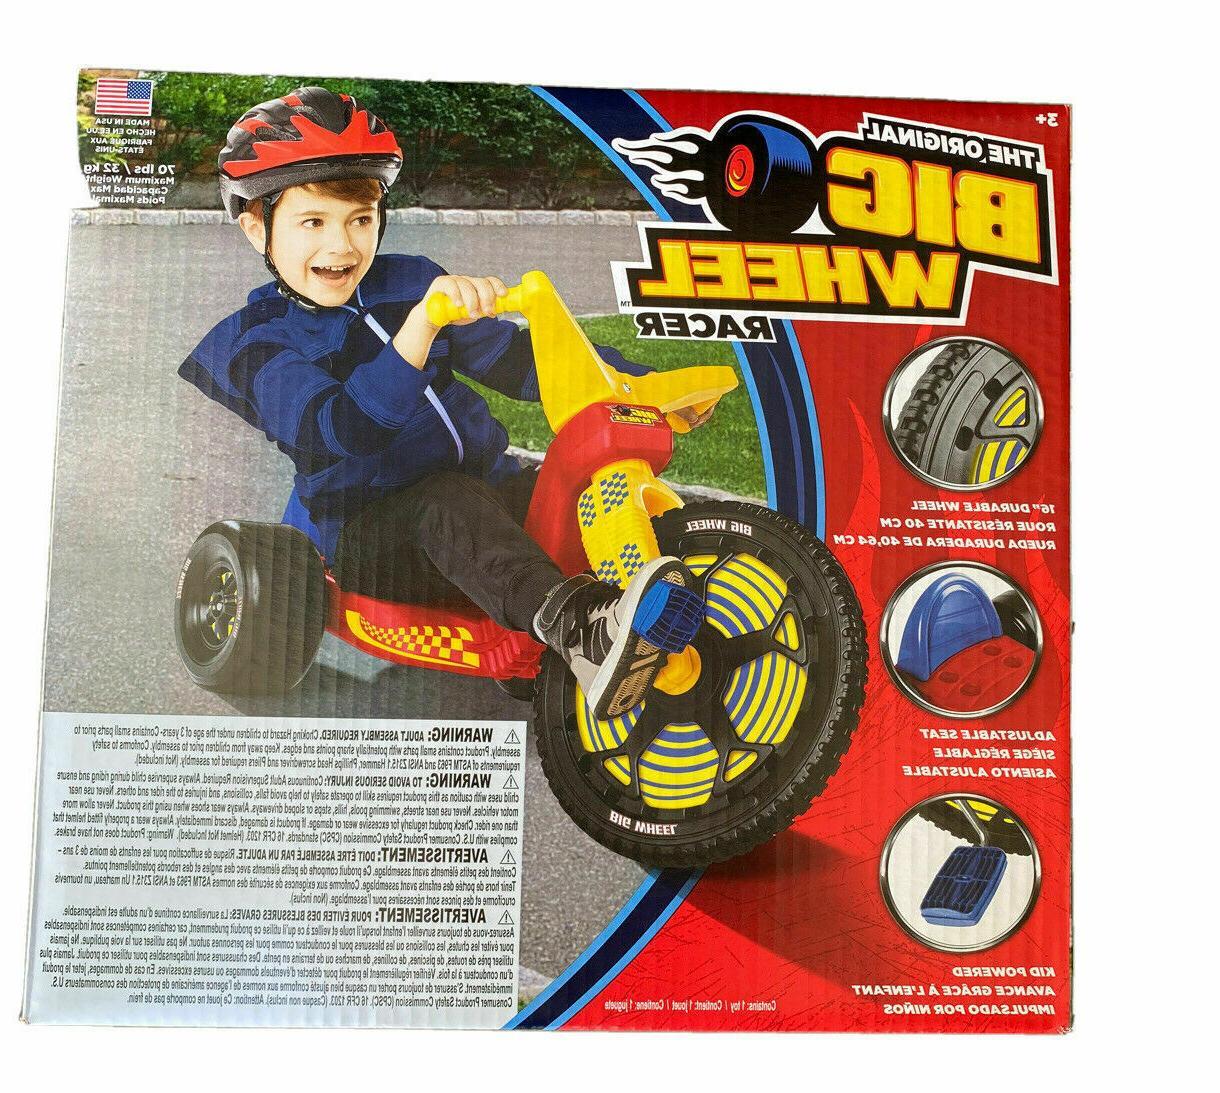 the original 16 inch big wheel racer